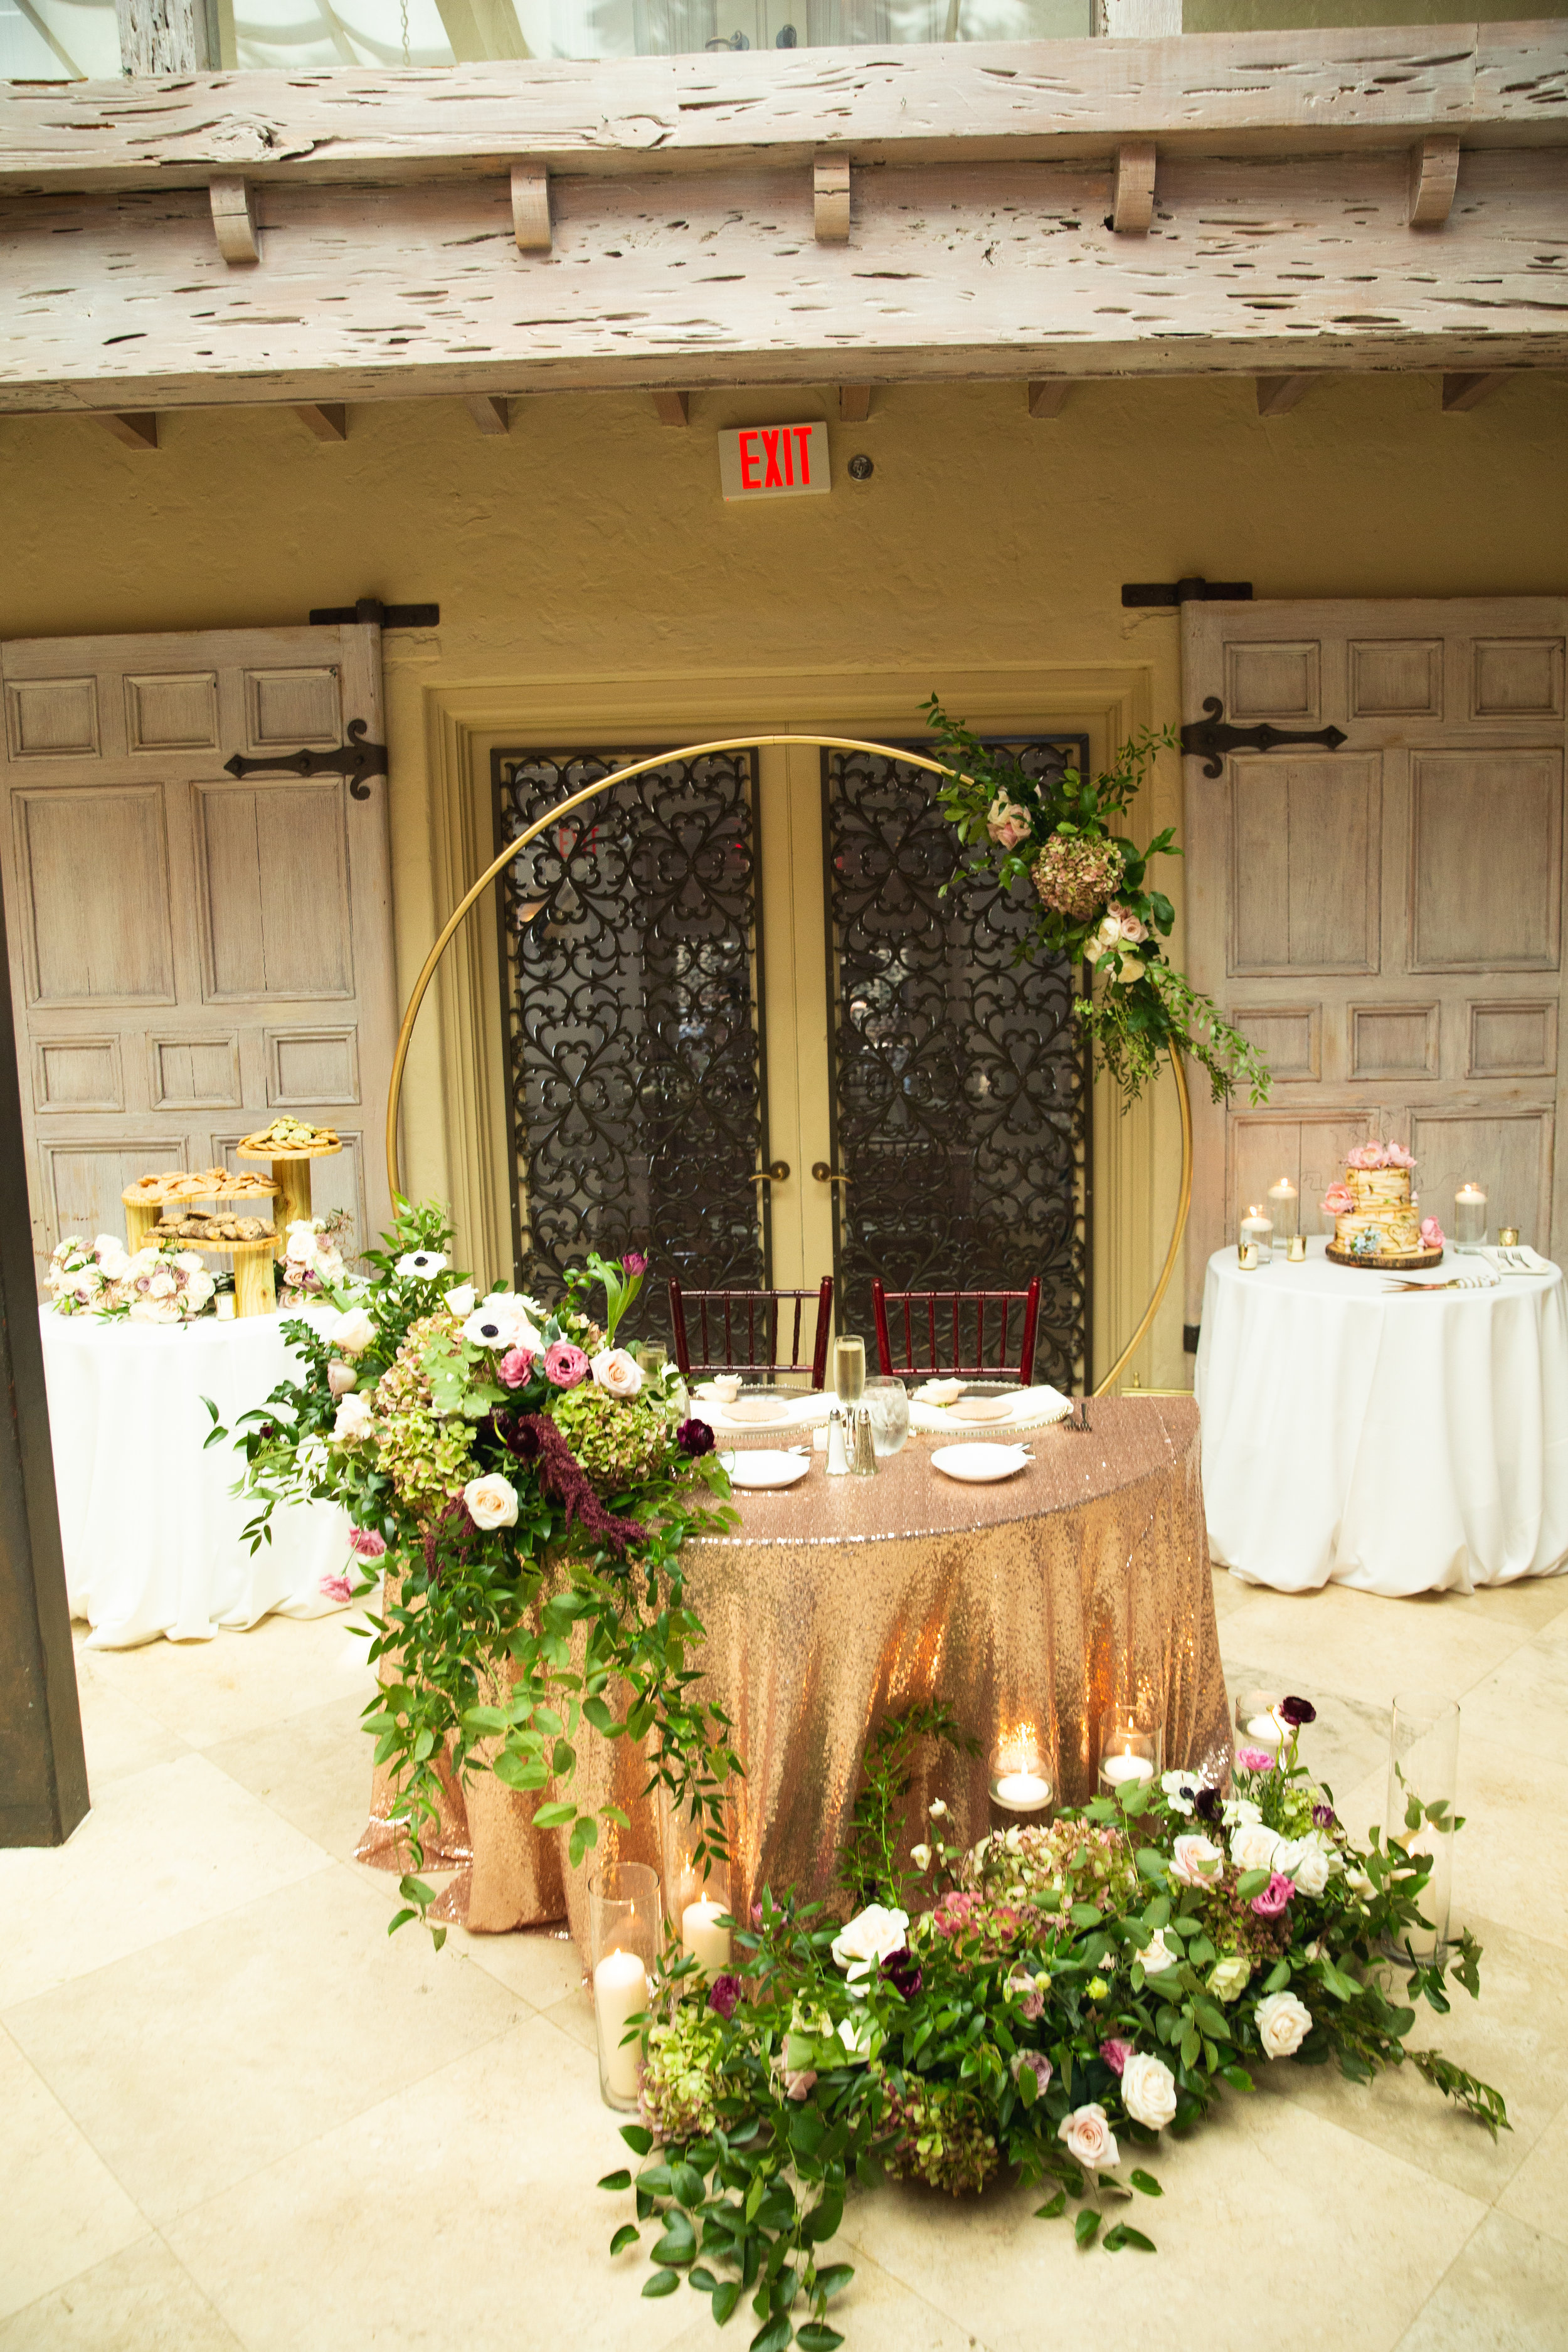 The Addison Boca Raton, South Florida Wedding, Sweetheart Table, Garden Glam Wedding, South Florida Wedding Florist.jpg